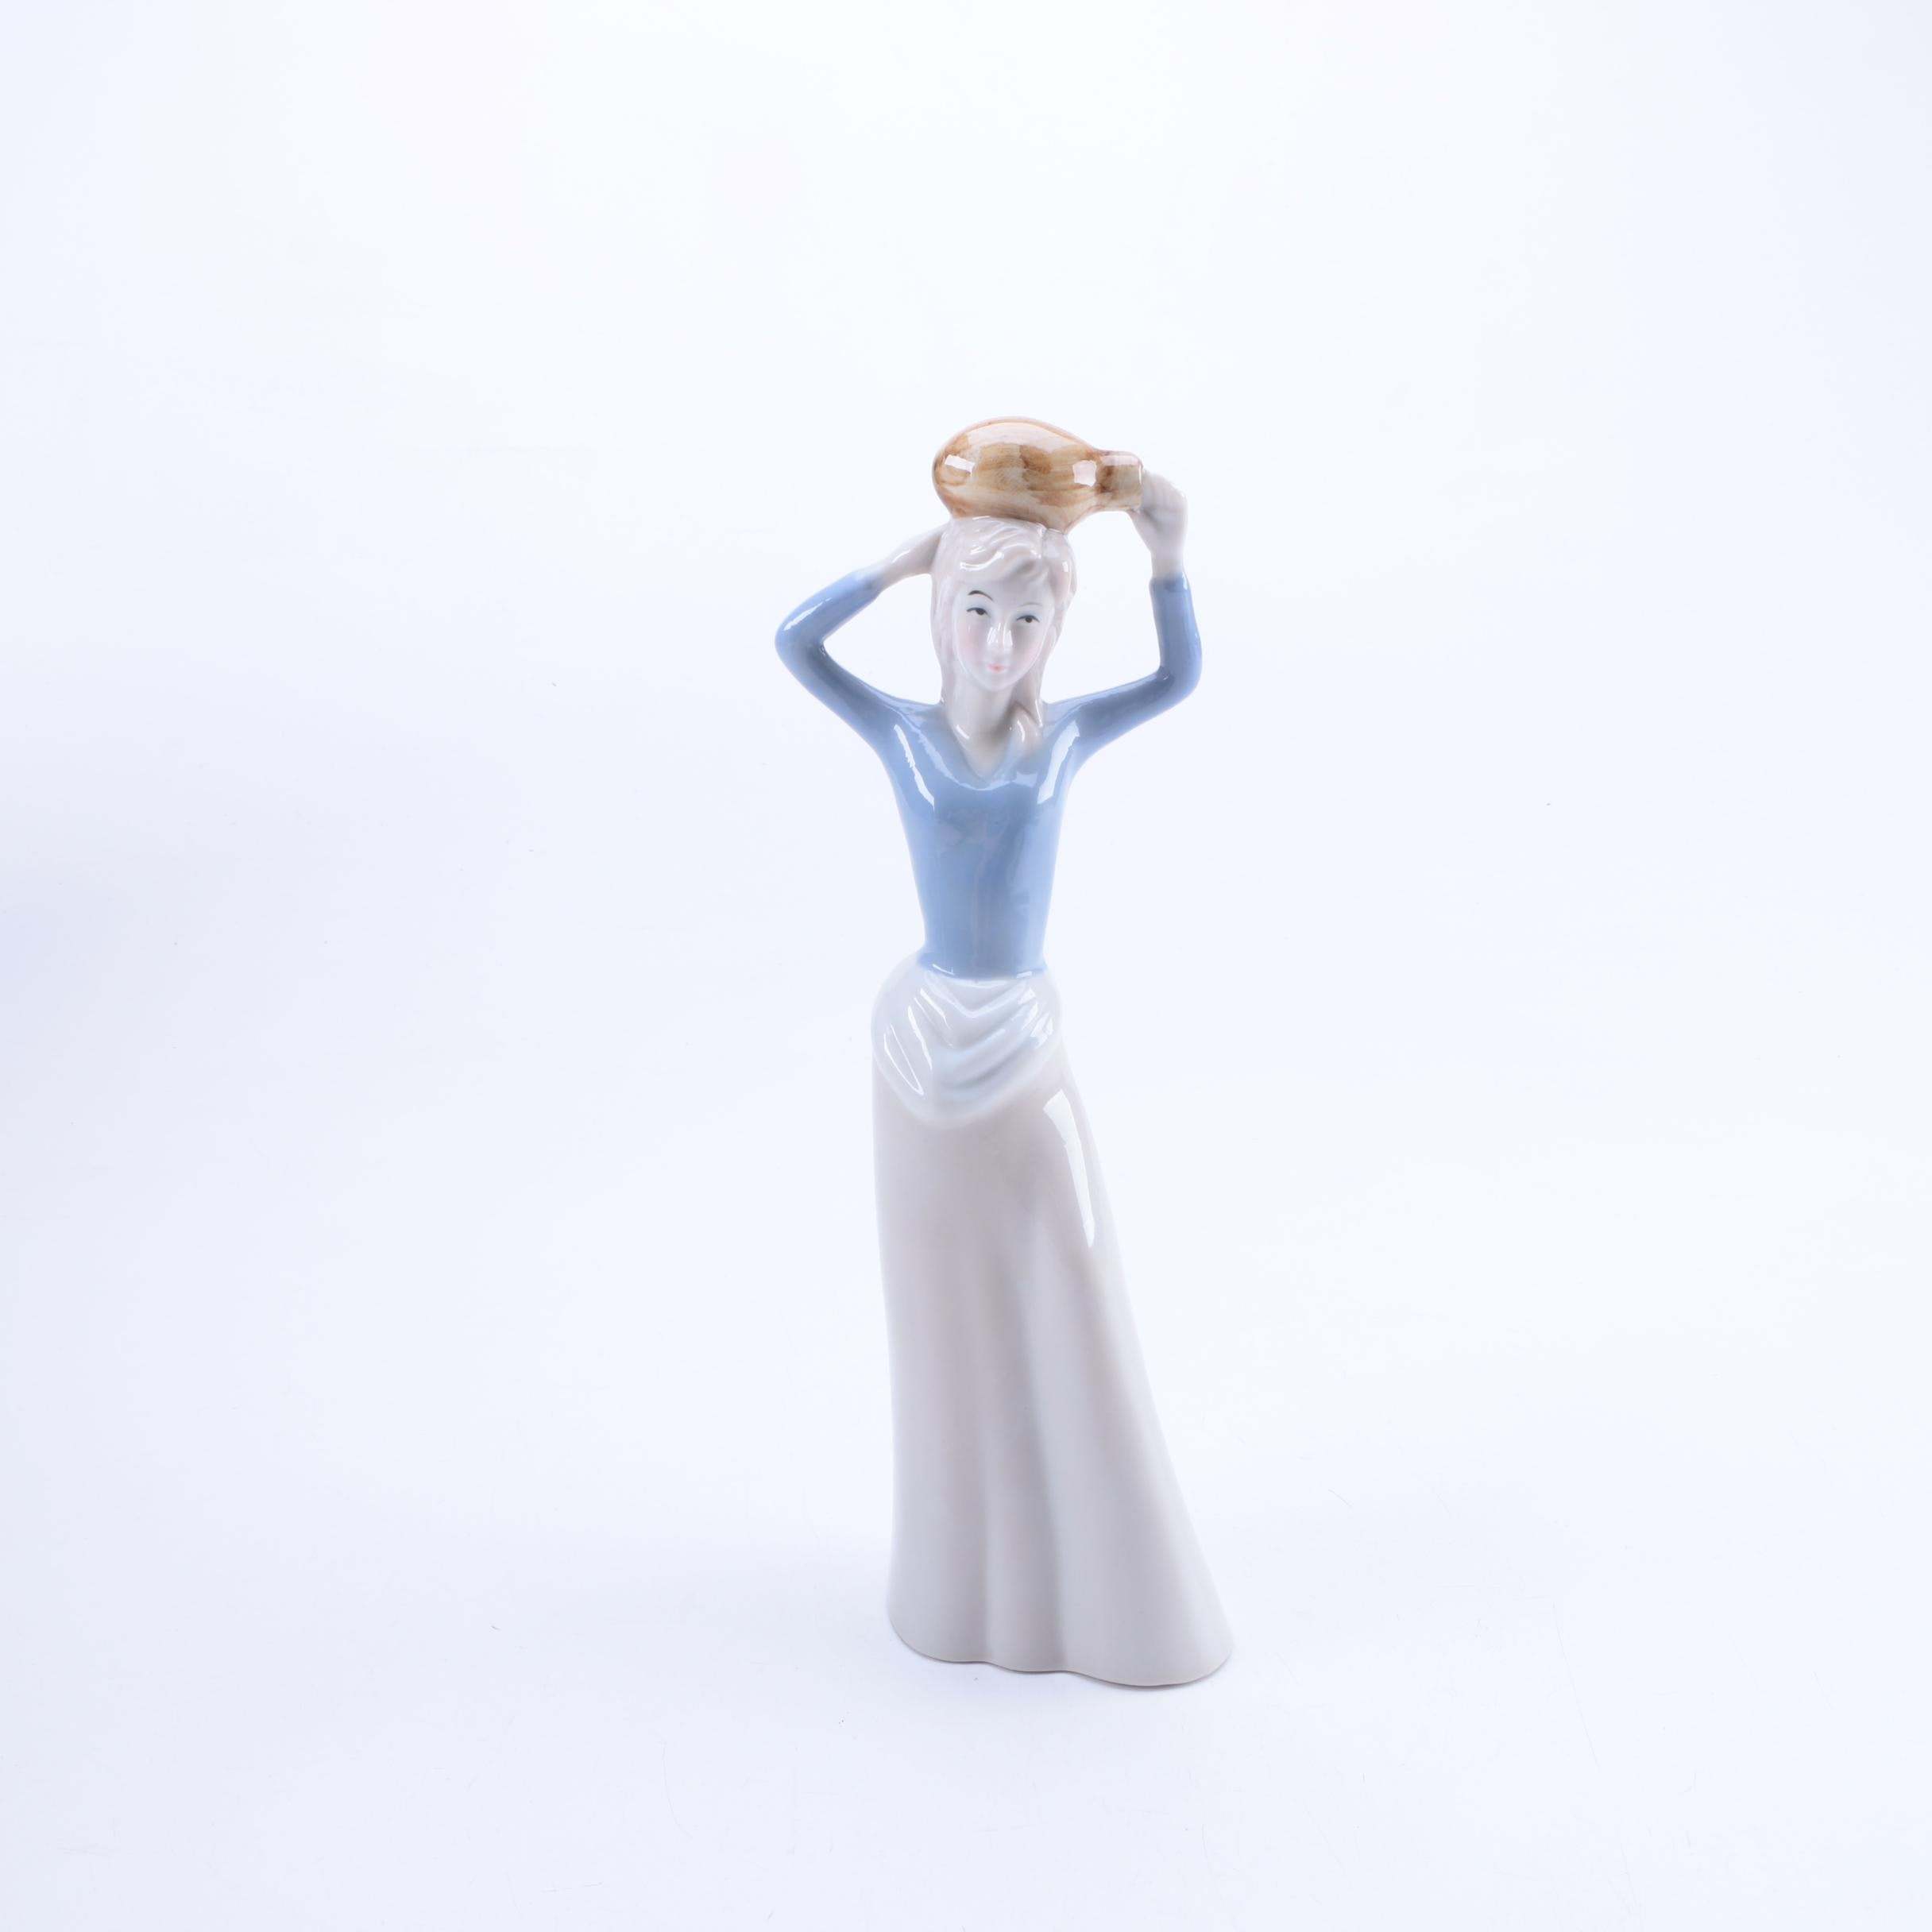 Porcelain Woman Figurine